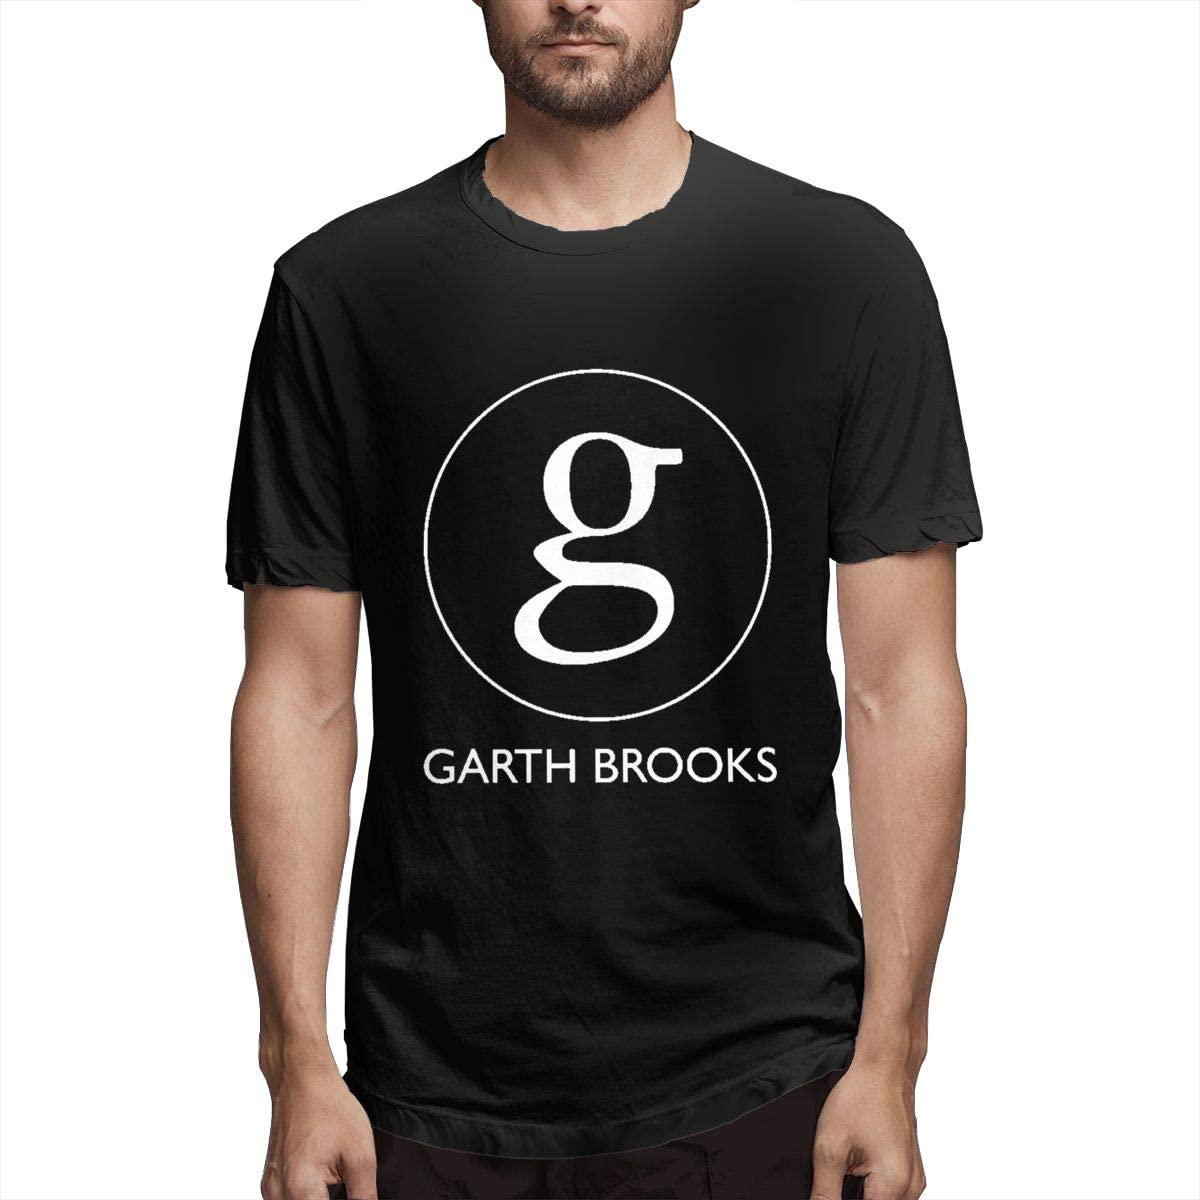 Men's Short Sleeve T-Shirt Daily Comfortable Round Neck Tee Cotton Stylish Shirts